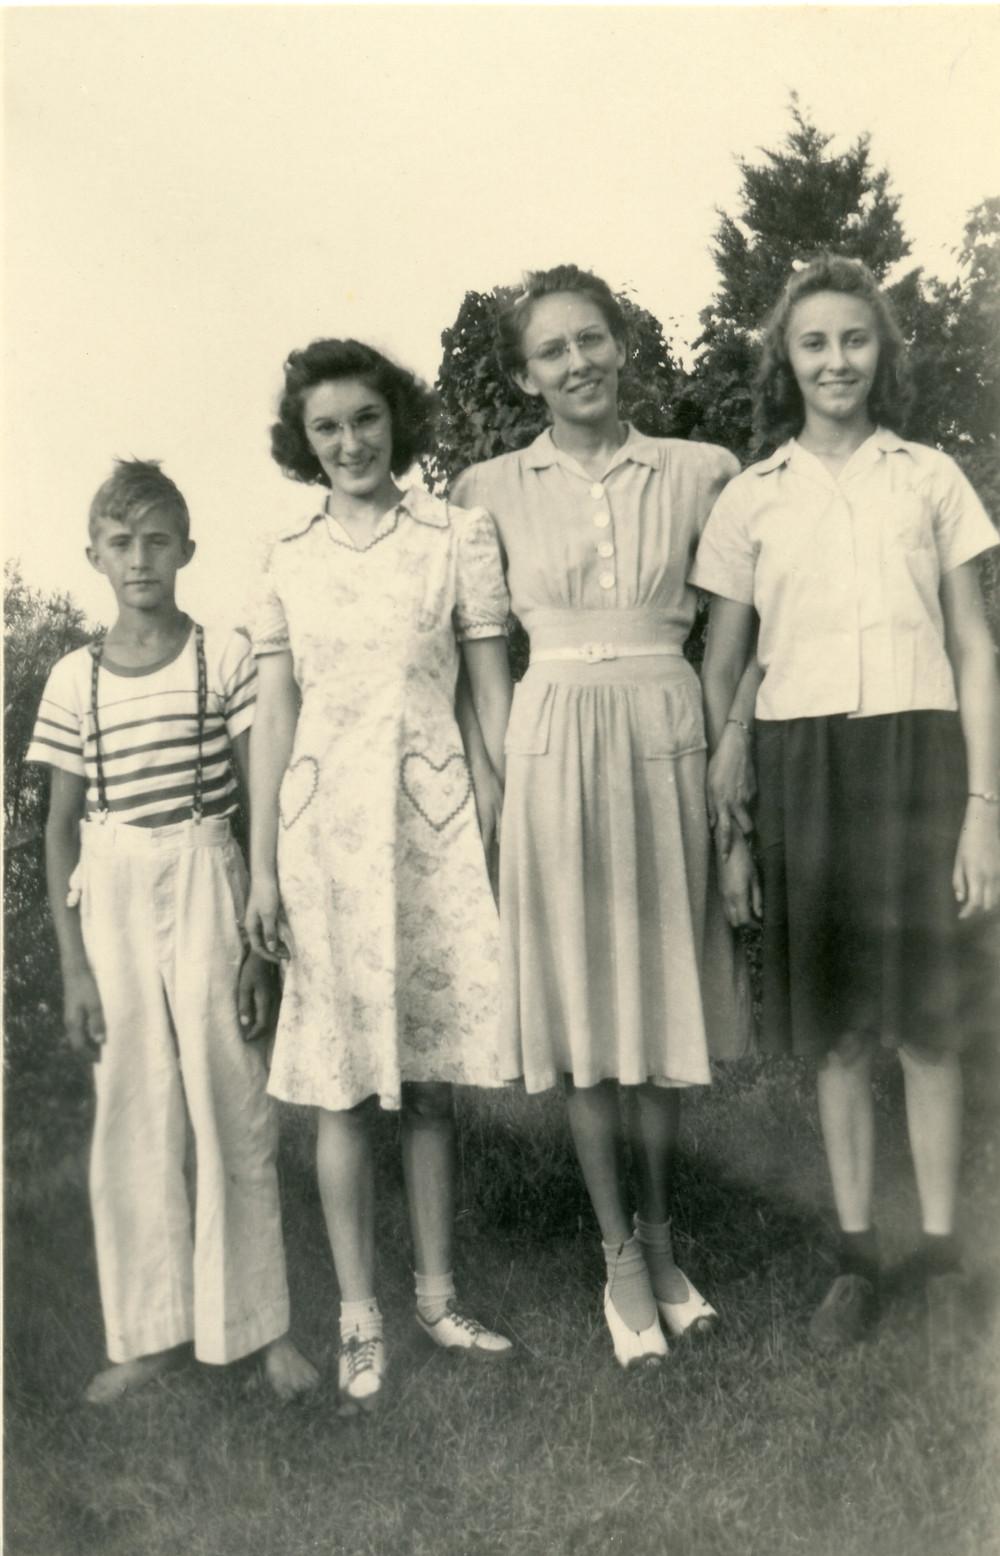 Photograph of Eldon, Lois, Arlene, and Ruth Morris.